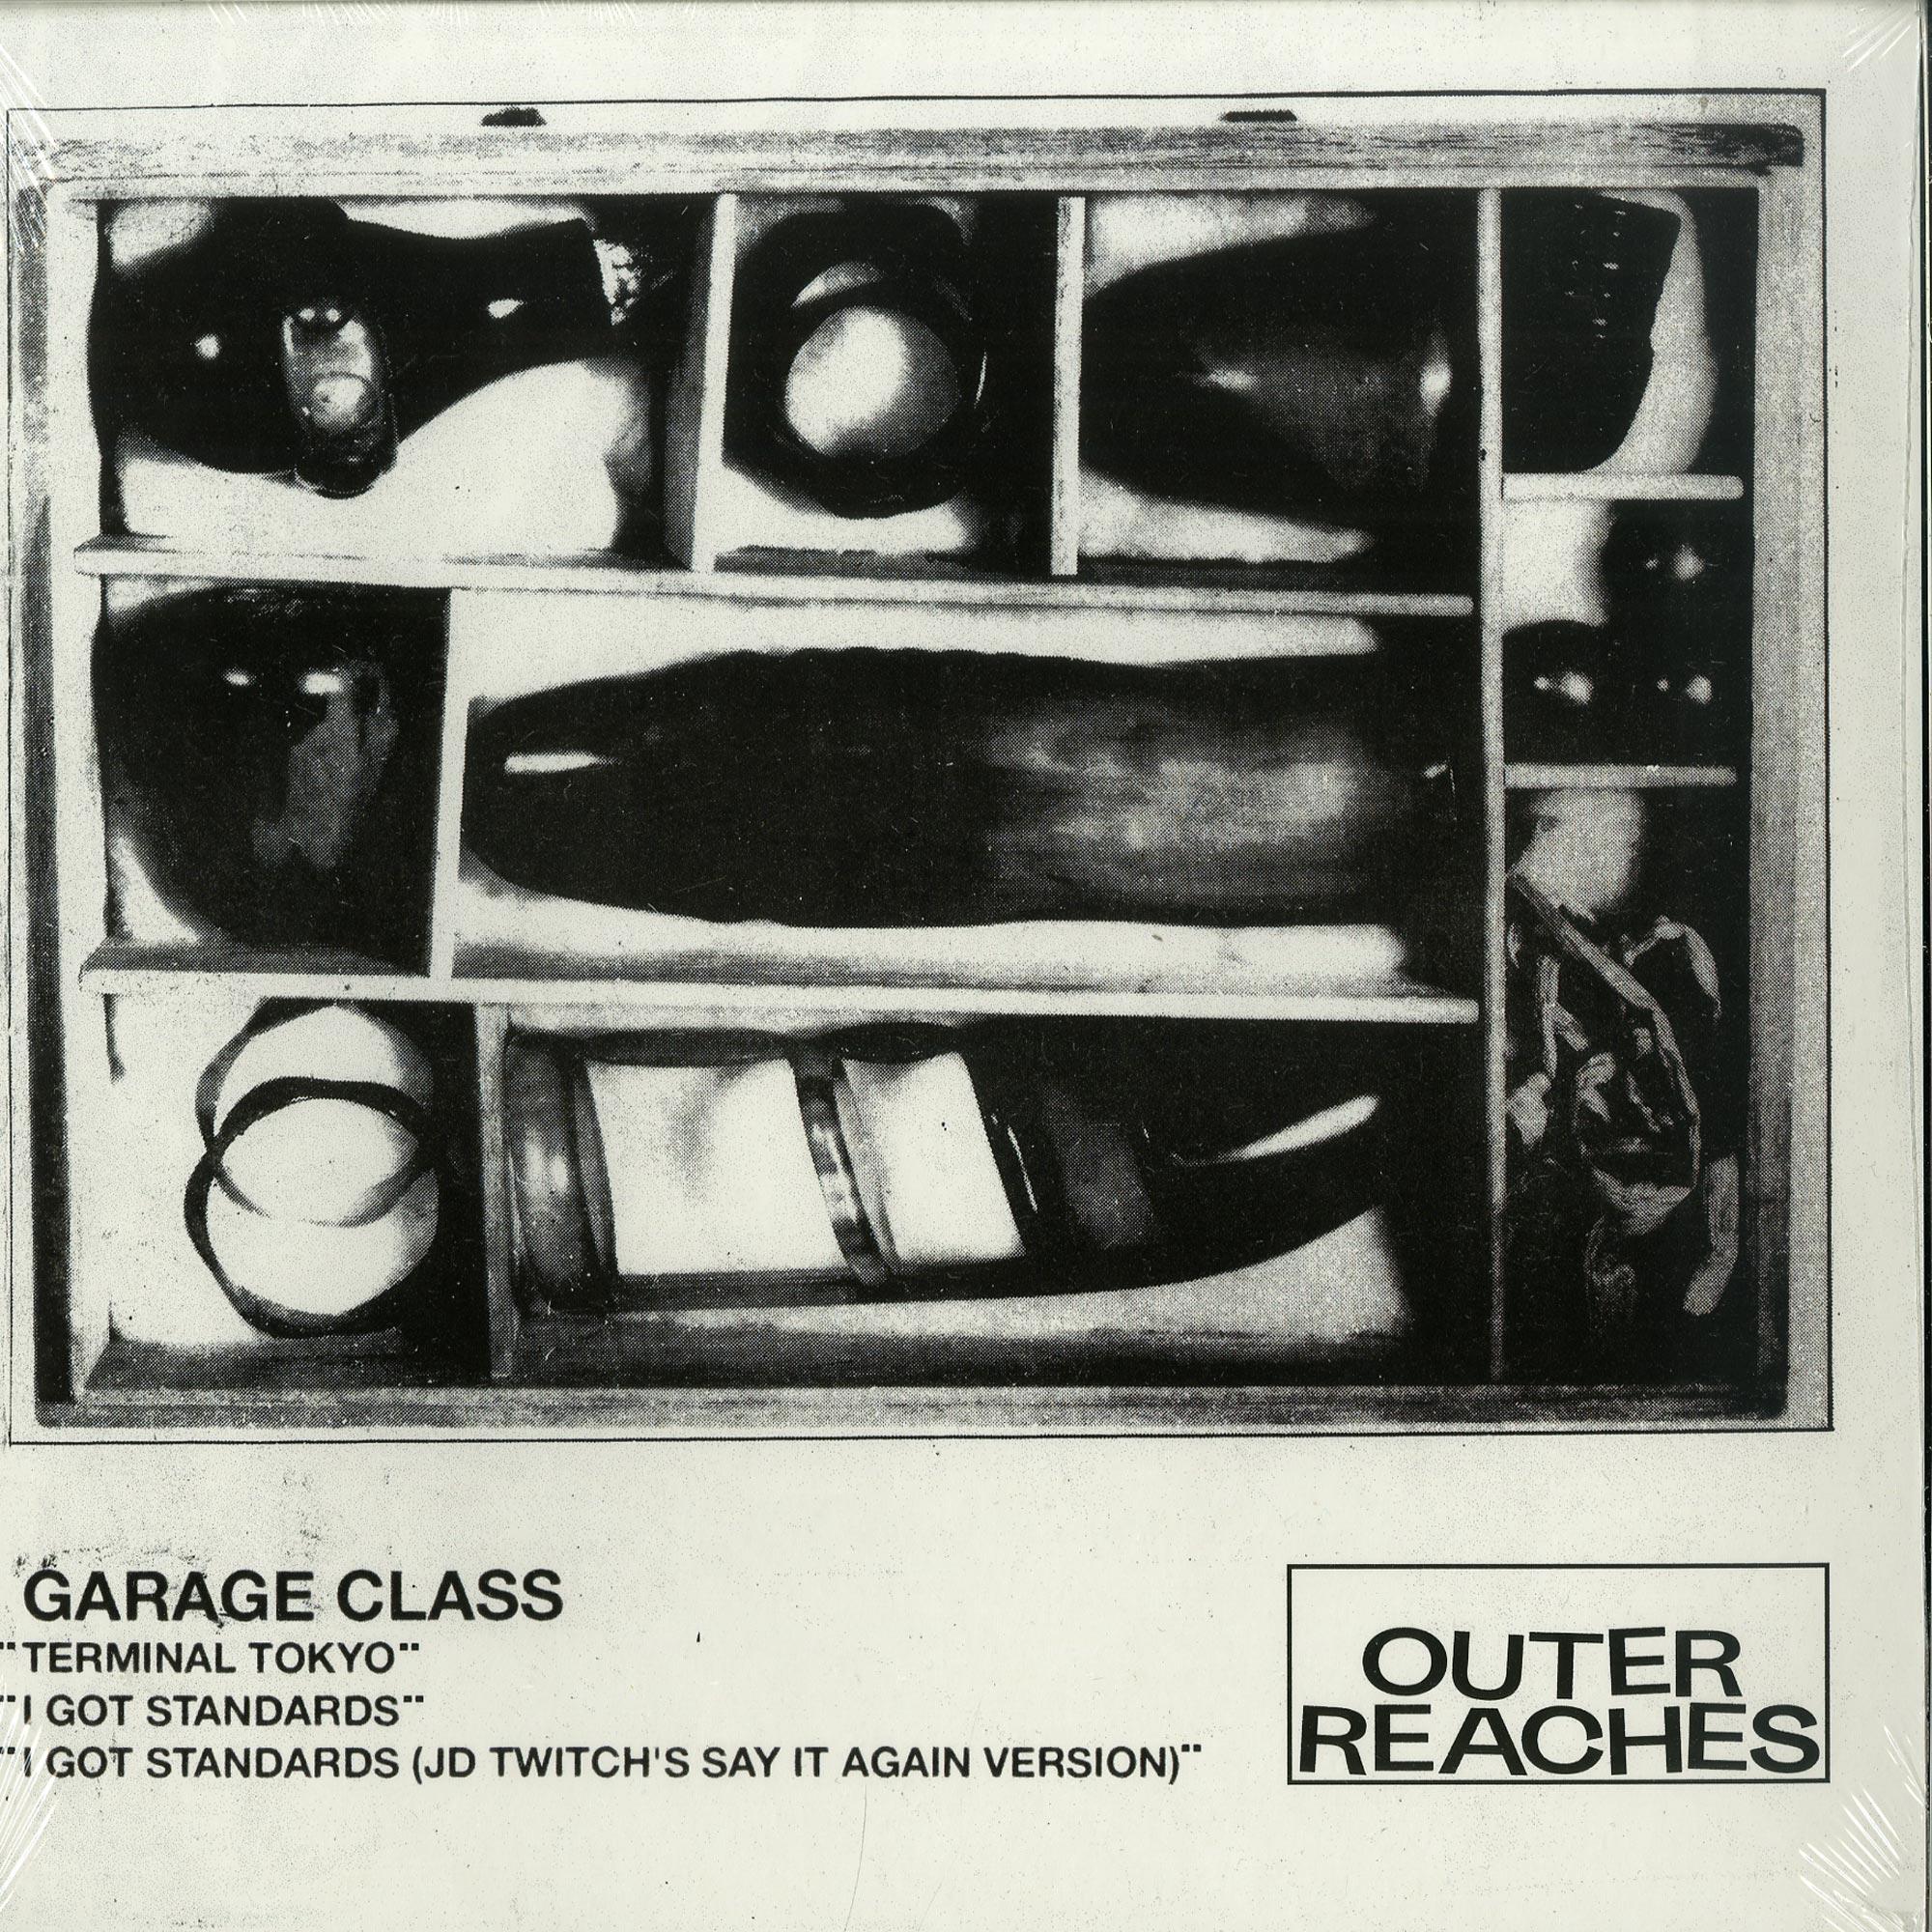 Garage Class - TERMINAL TOKYO